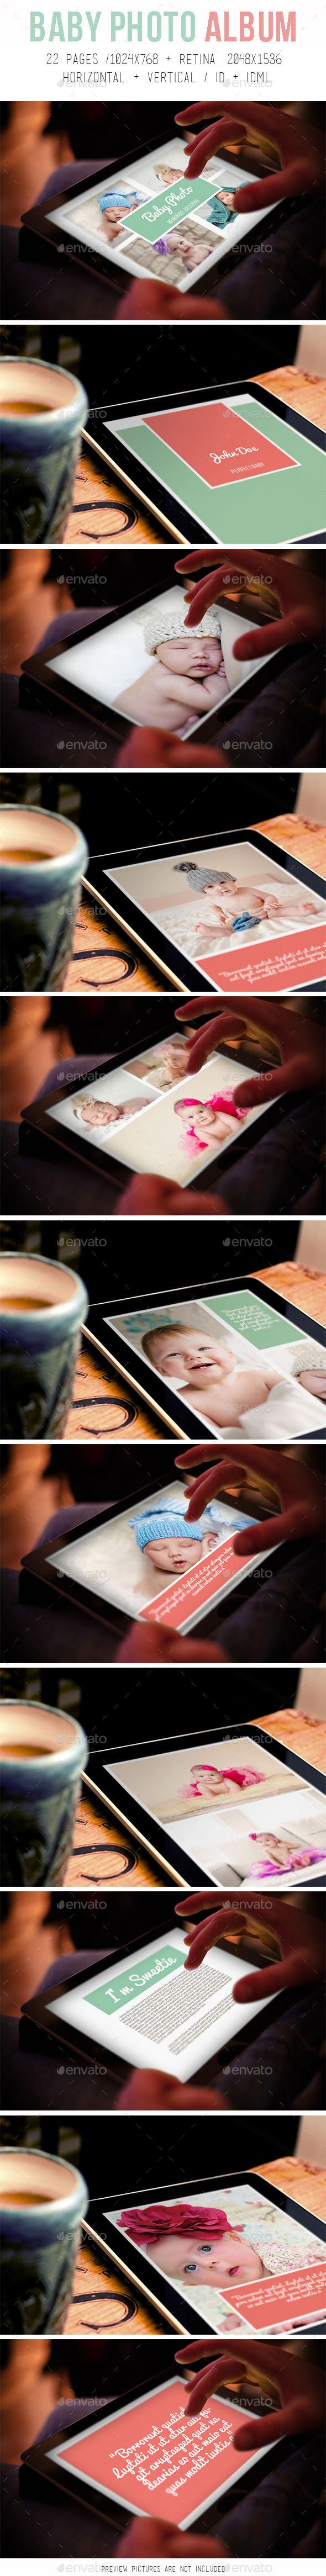 GraphicRiver Tablet Baby Photo Album 8884580